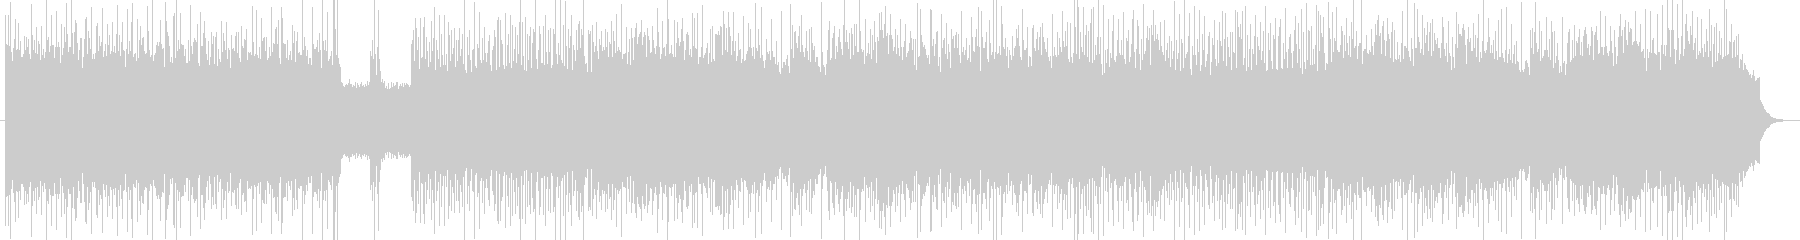 「HR/HM」「POWER」BGM229の未再生の波形